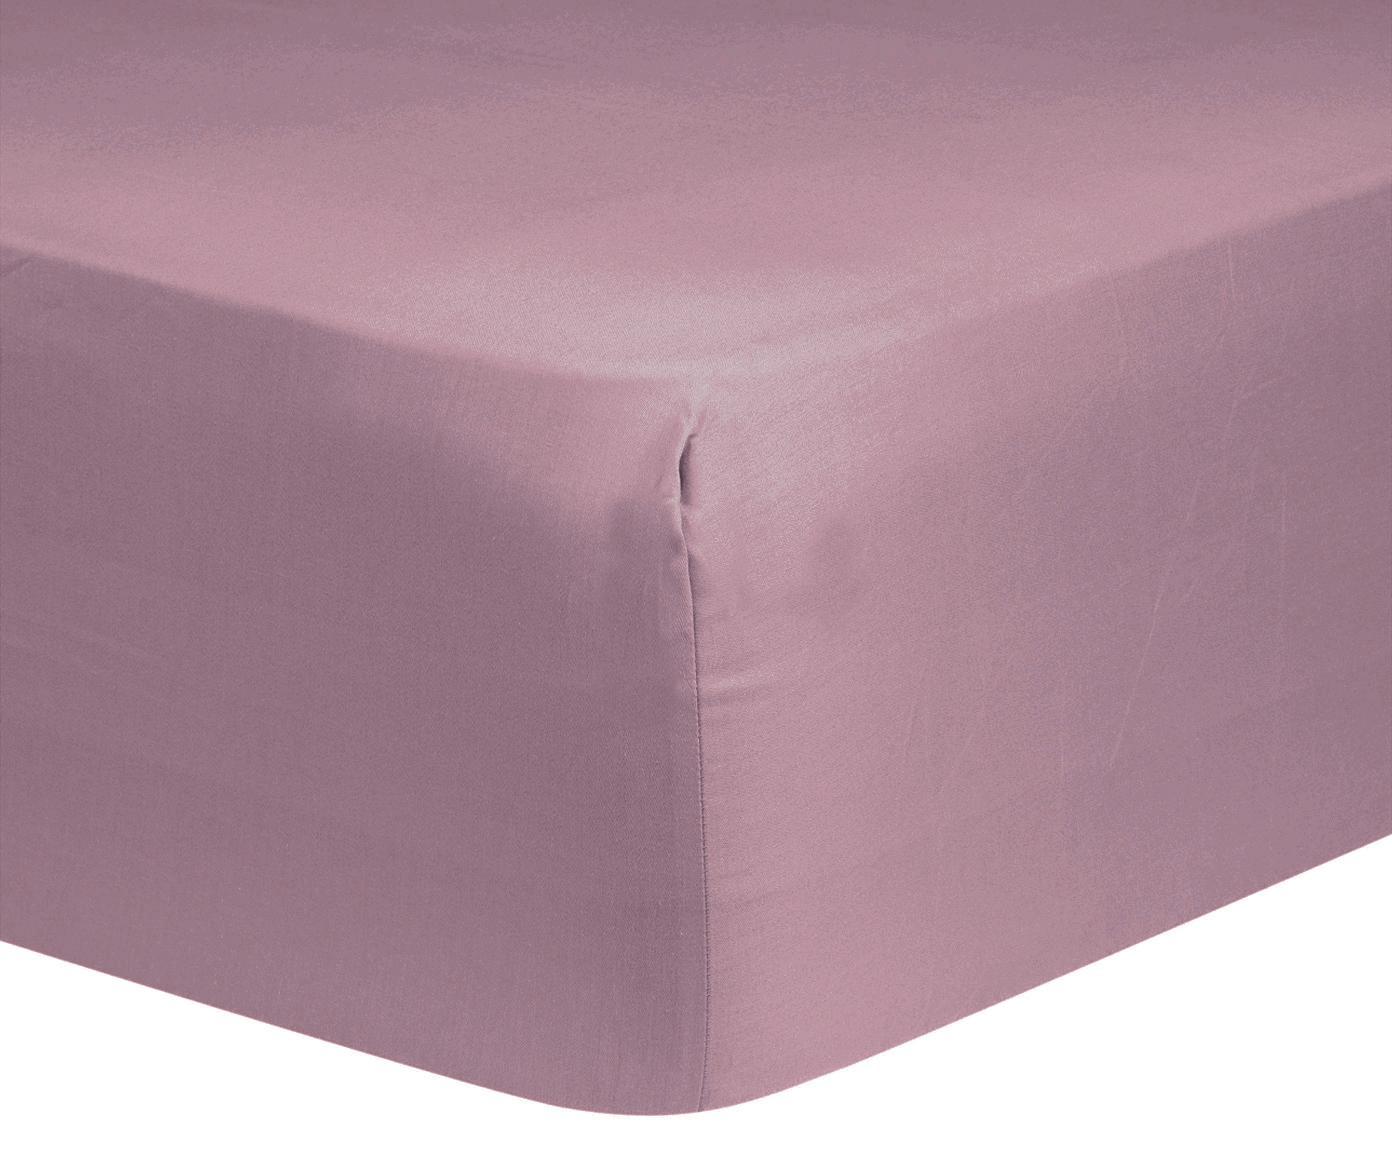 Sábana bajera de satén Comfort, Malva, Cama 90 cm (90 x 200 cm)